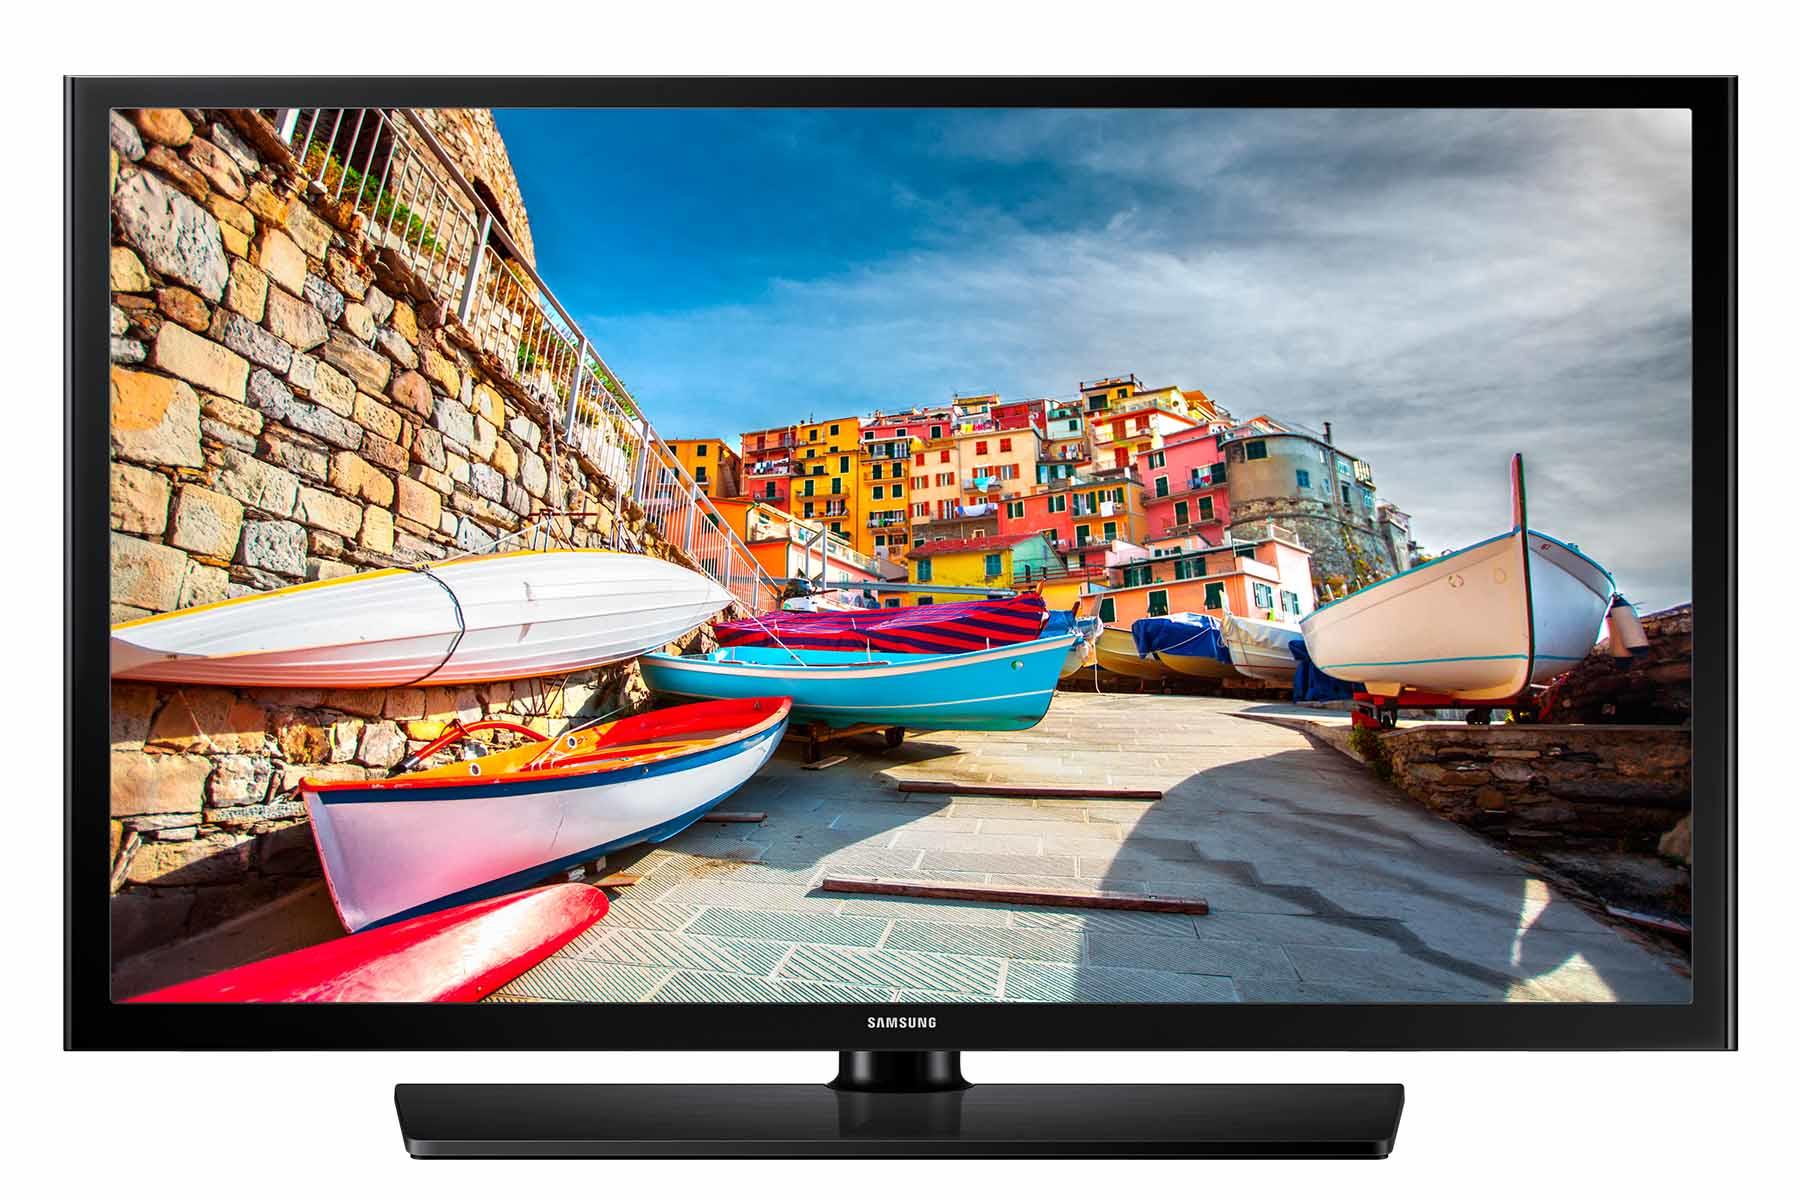 Samsung HG40EE590SKXXU 40 INCH Smart FHD Commercial TV